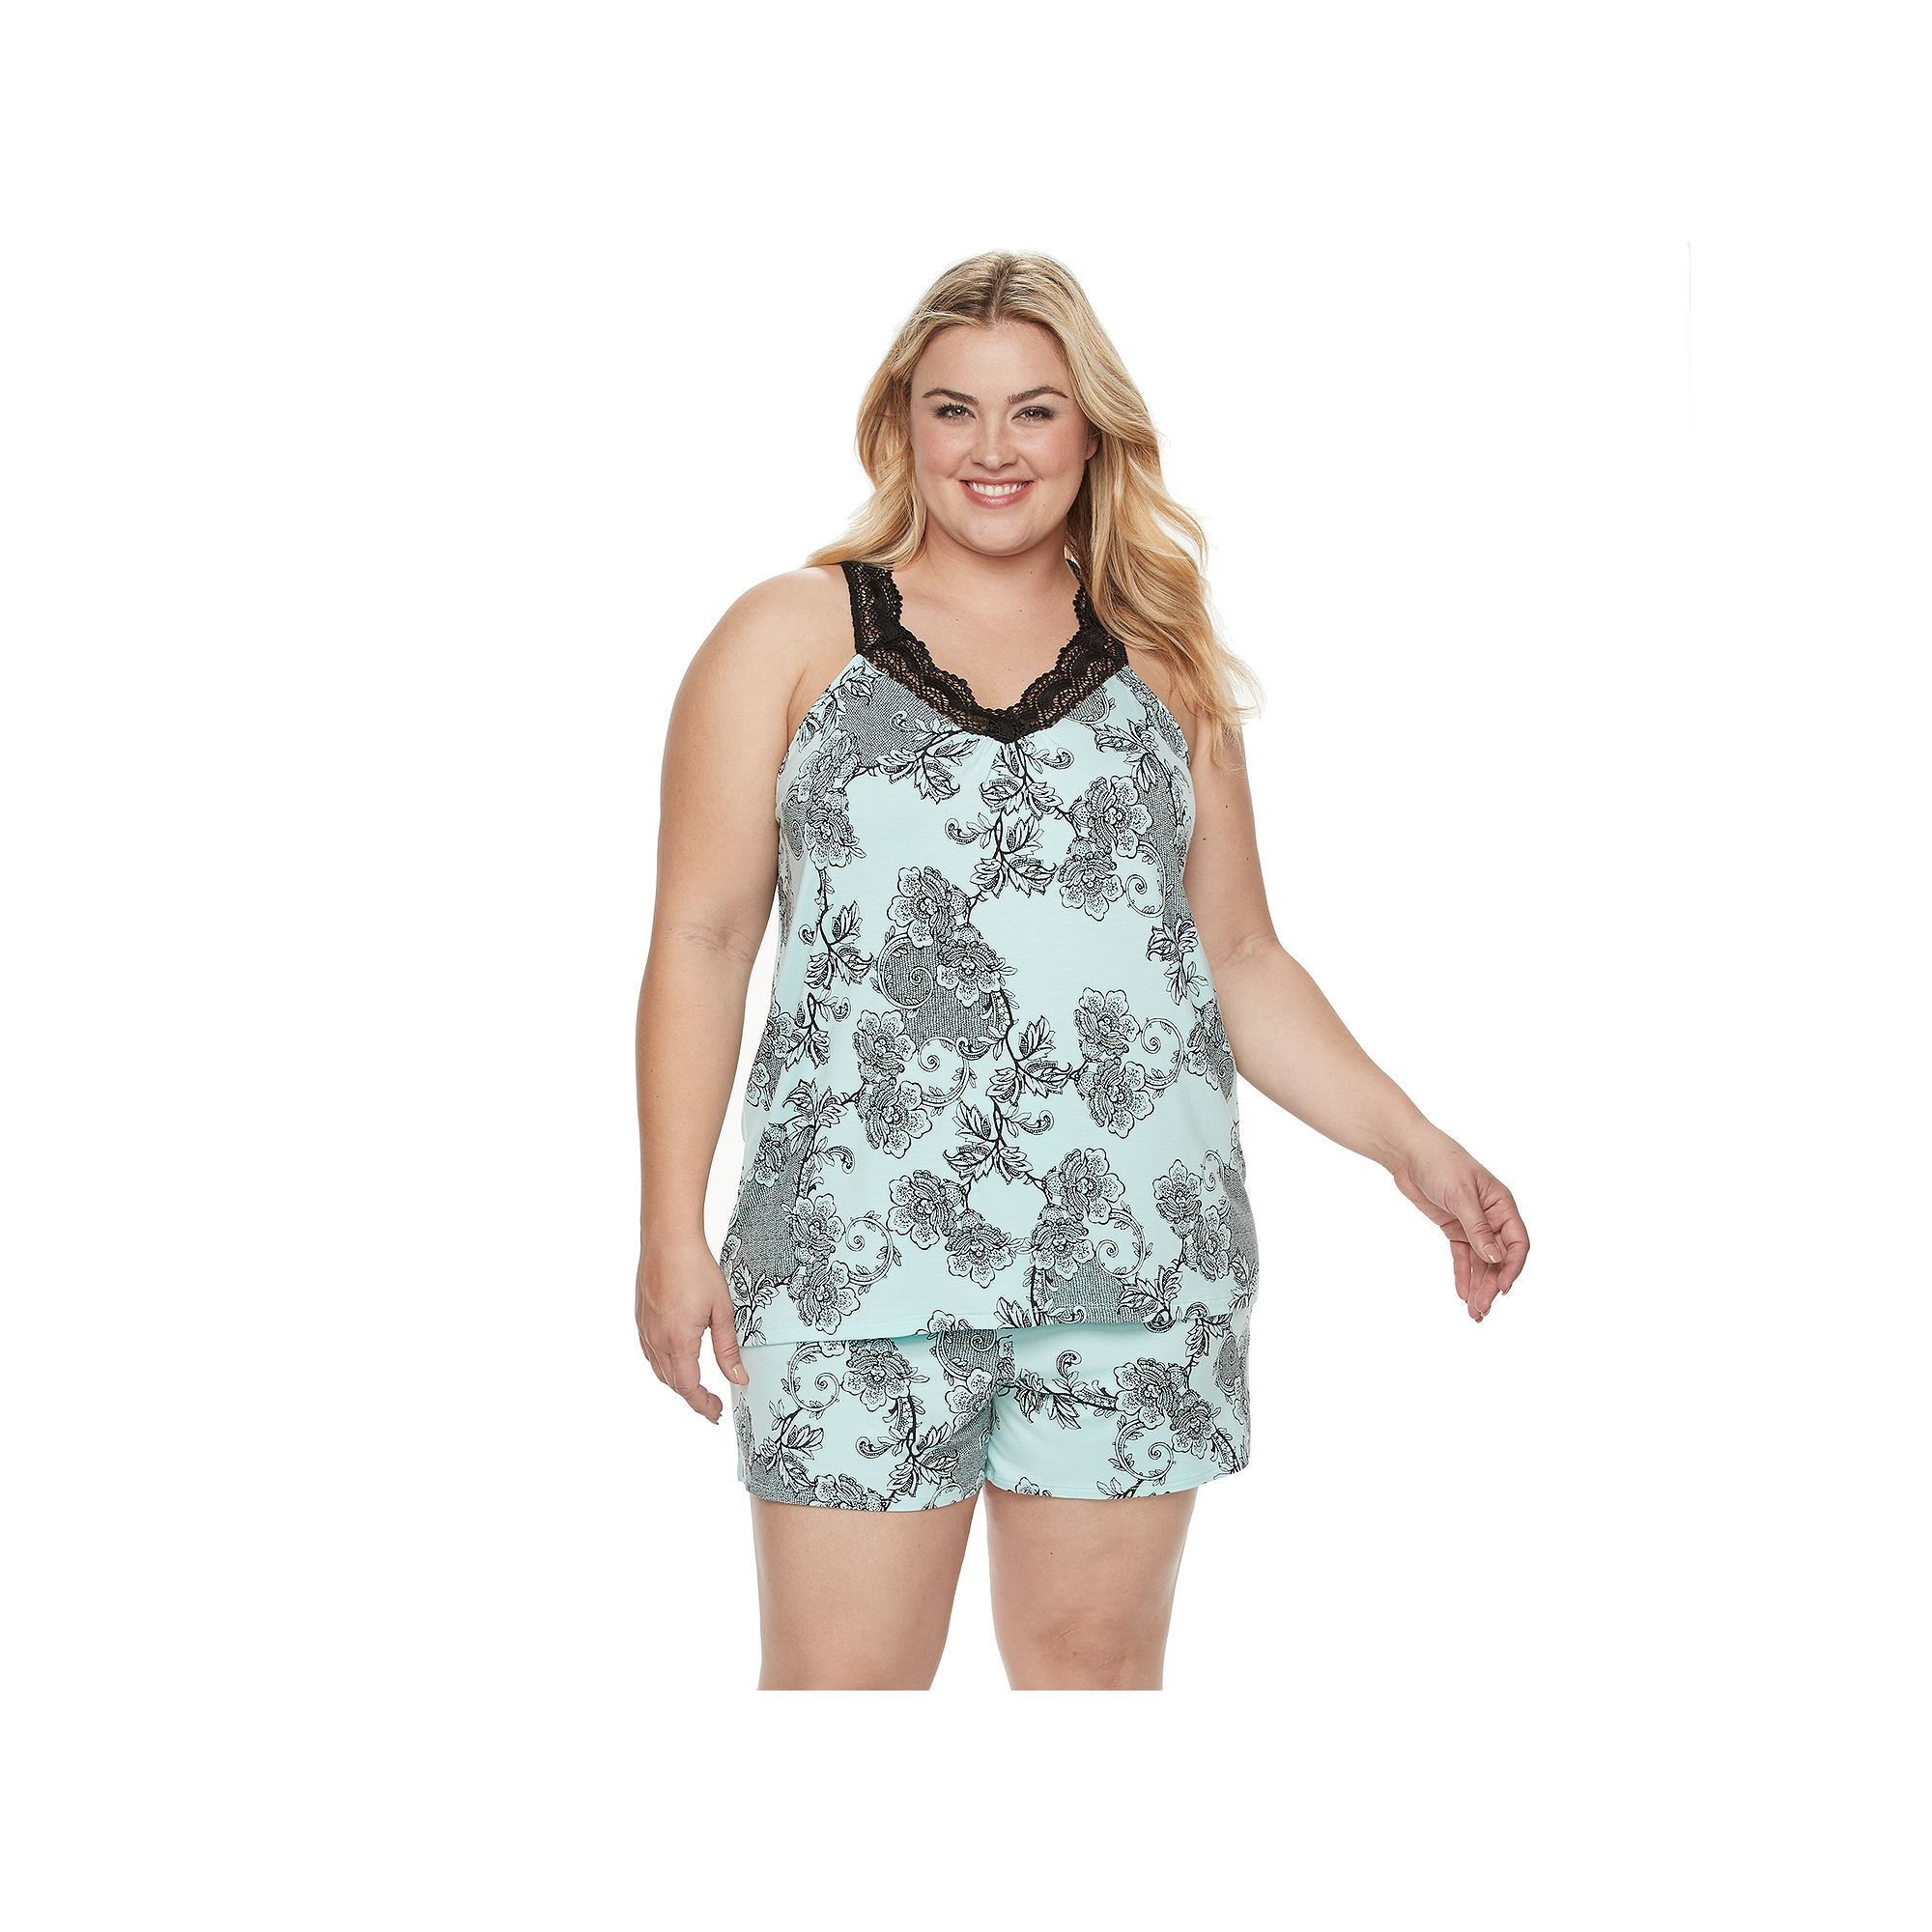 Plus Size Apt. 9® Pajamas: Love Story Tank & Shorts PJ Set, Women's, Size: 3XL, Brt Blue